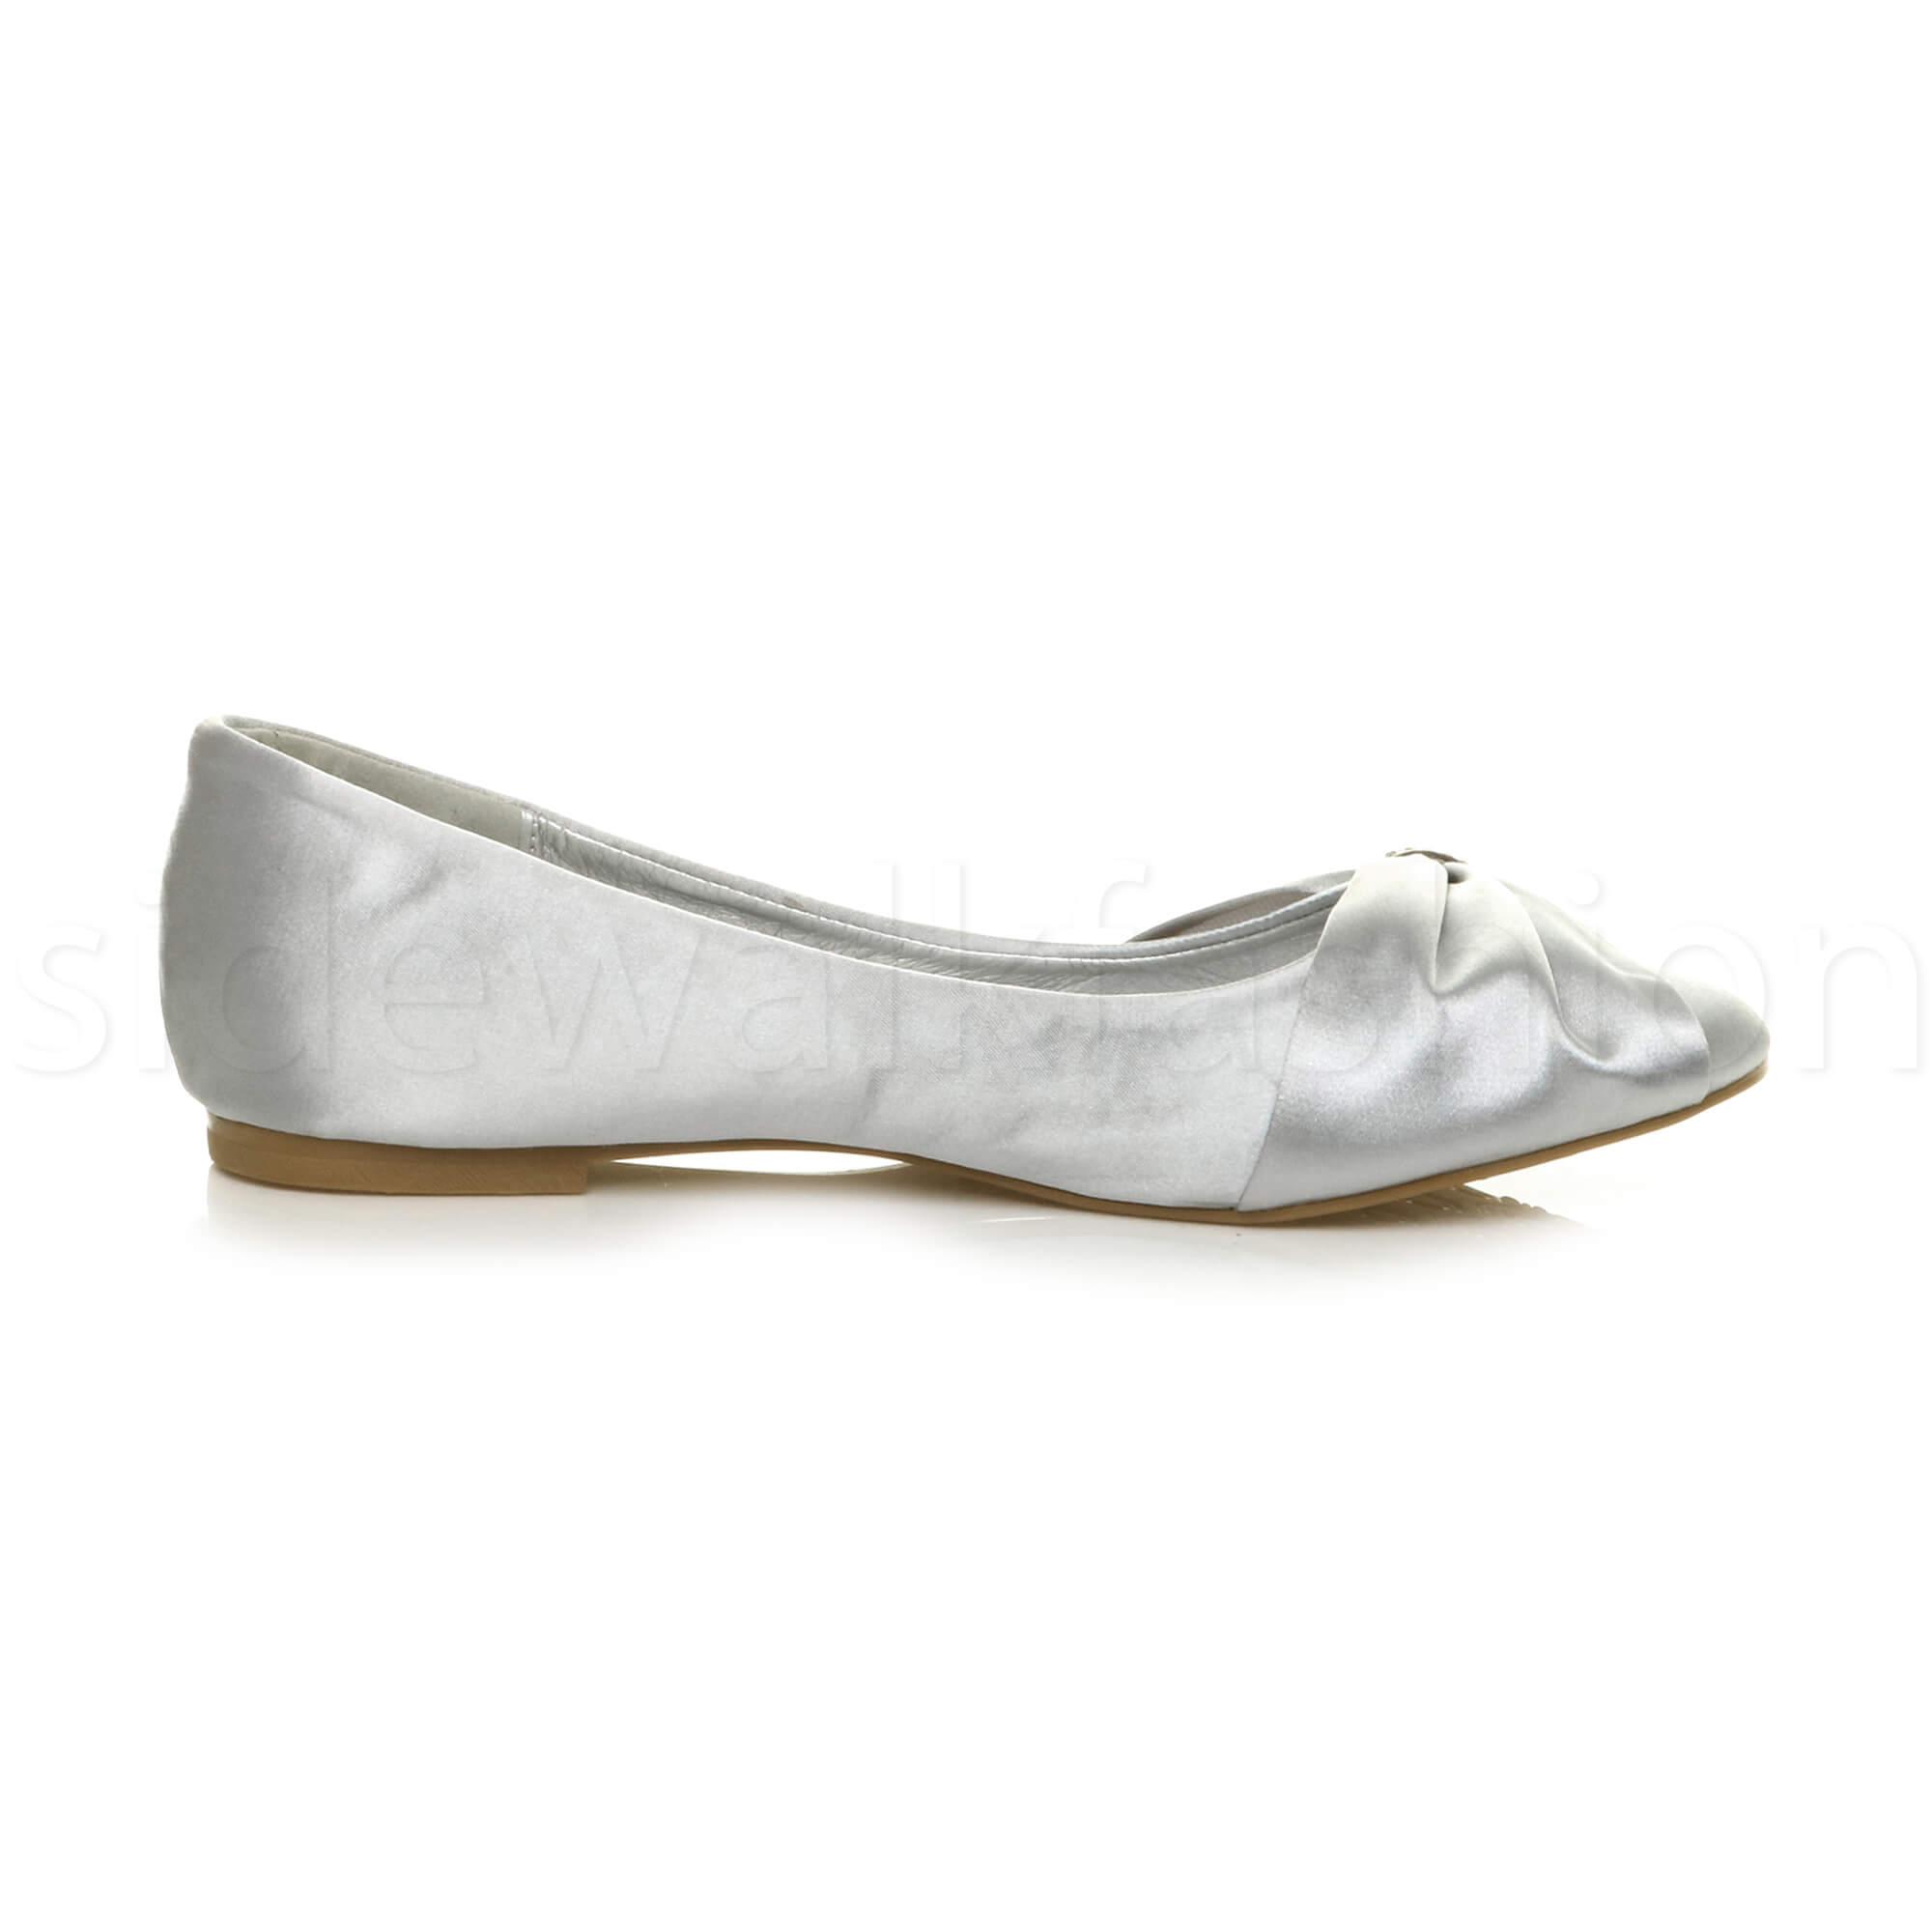 Womens-ladies-flat-wedding-bridesmaid-ruched-diamante-bridal-shoes-pumps-size thumbnail 28